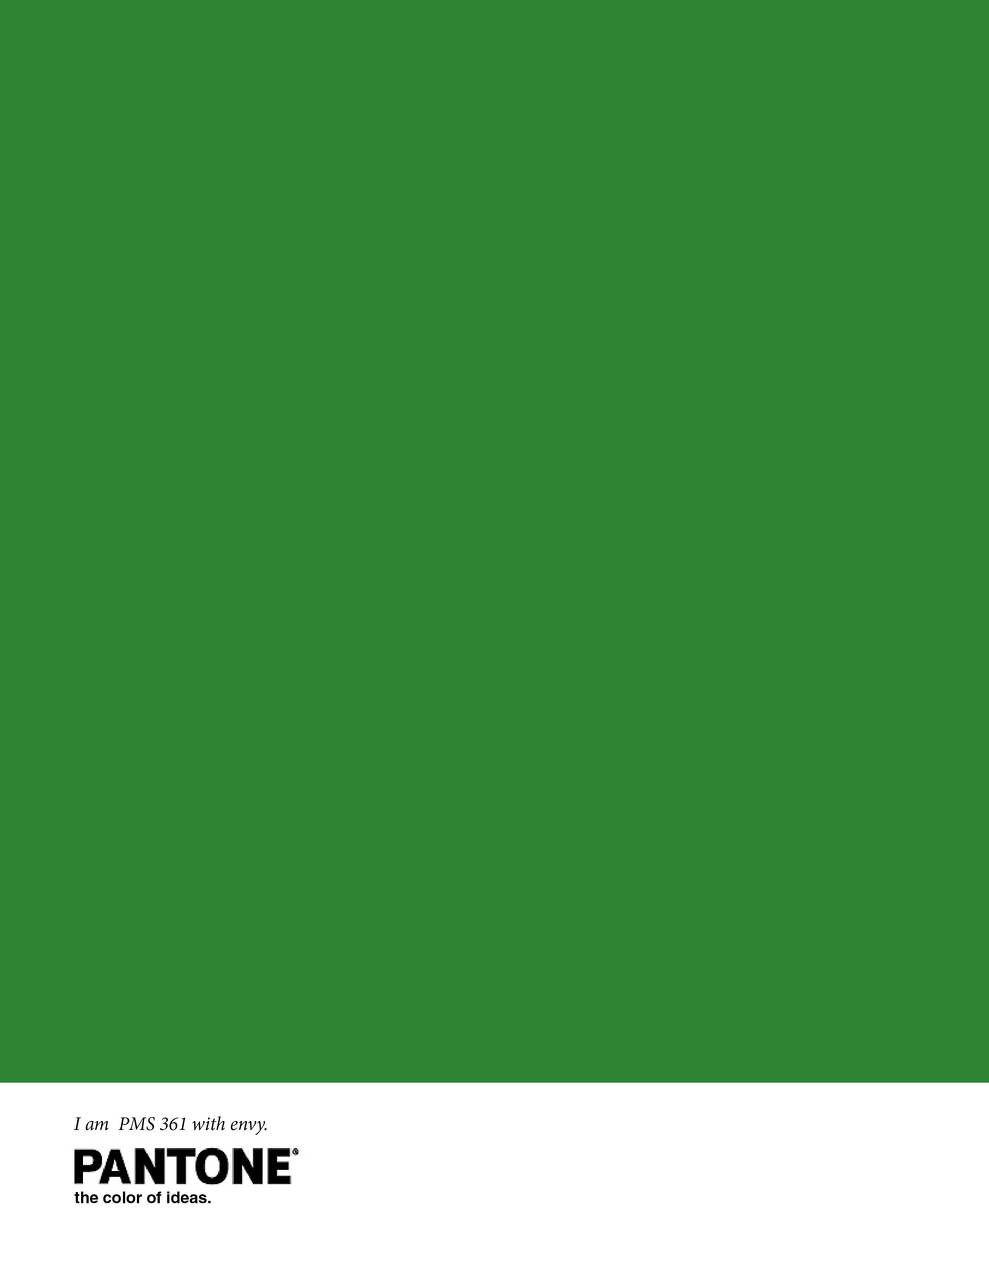 wix   portfolio created by jbonsanti based on blank website